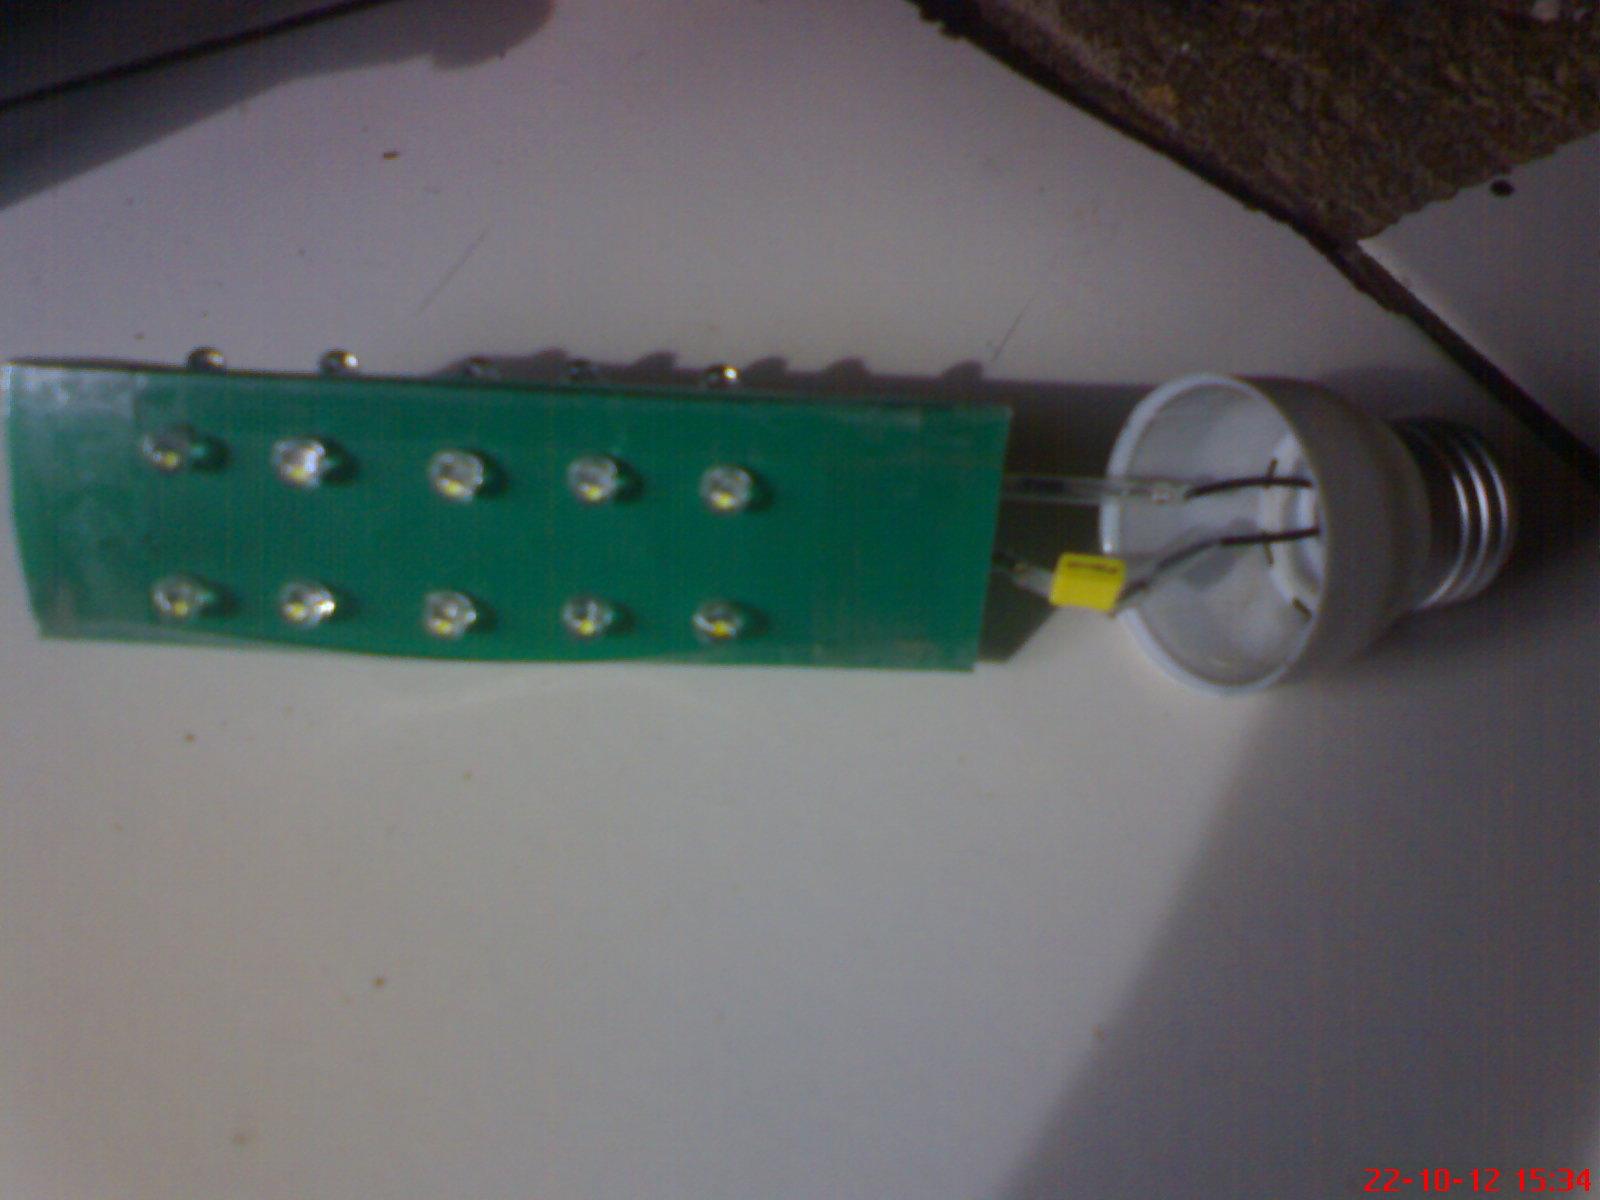 COMMUNITY GO GREEN (CGG): MEMBUAT LAMPU HEMAT ENERGI DARI LED AC 220 V ...